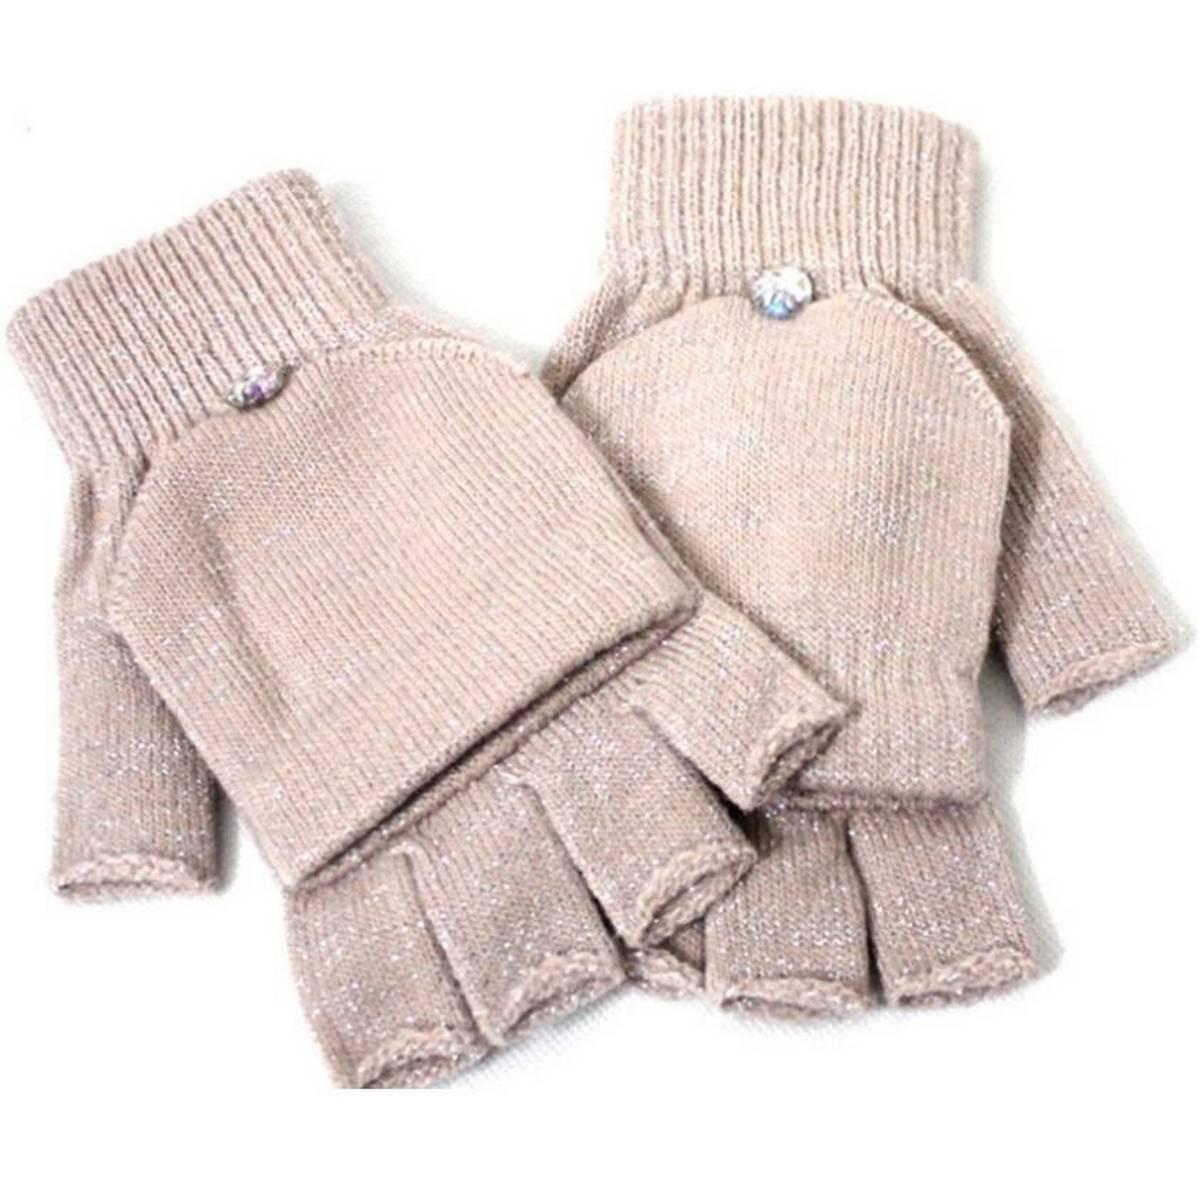 Women Winter Airsoft Mittens Hand Warmer Wool Gloves